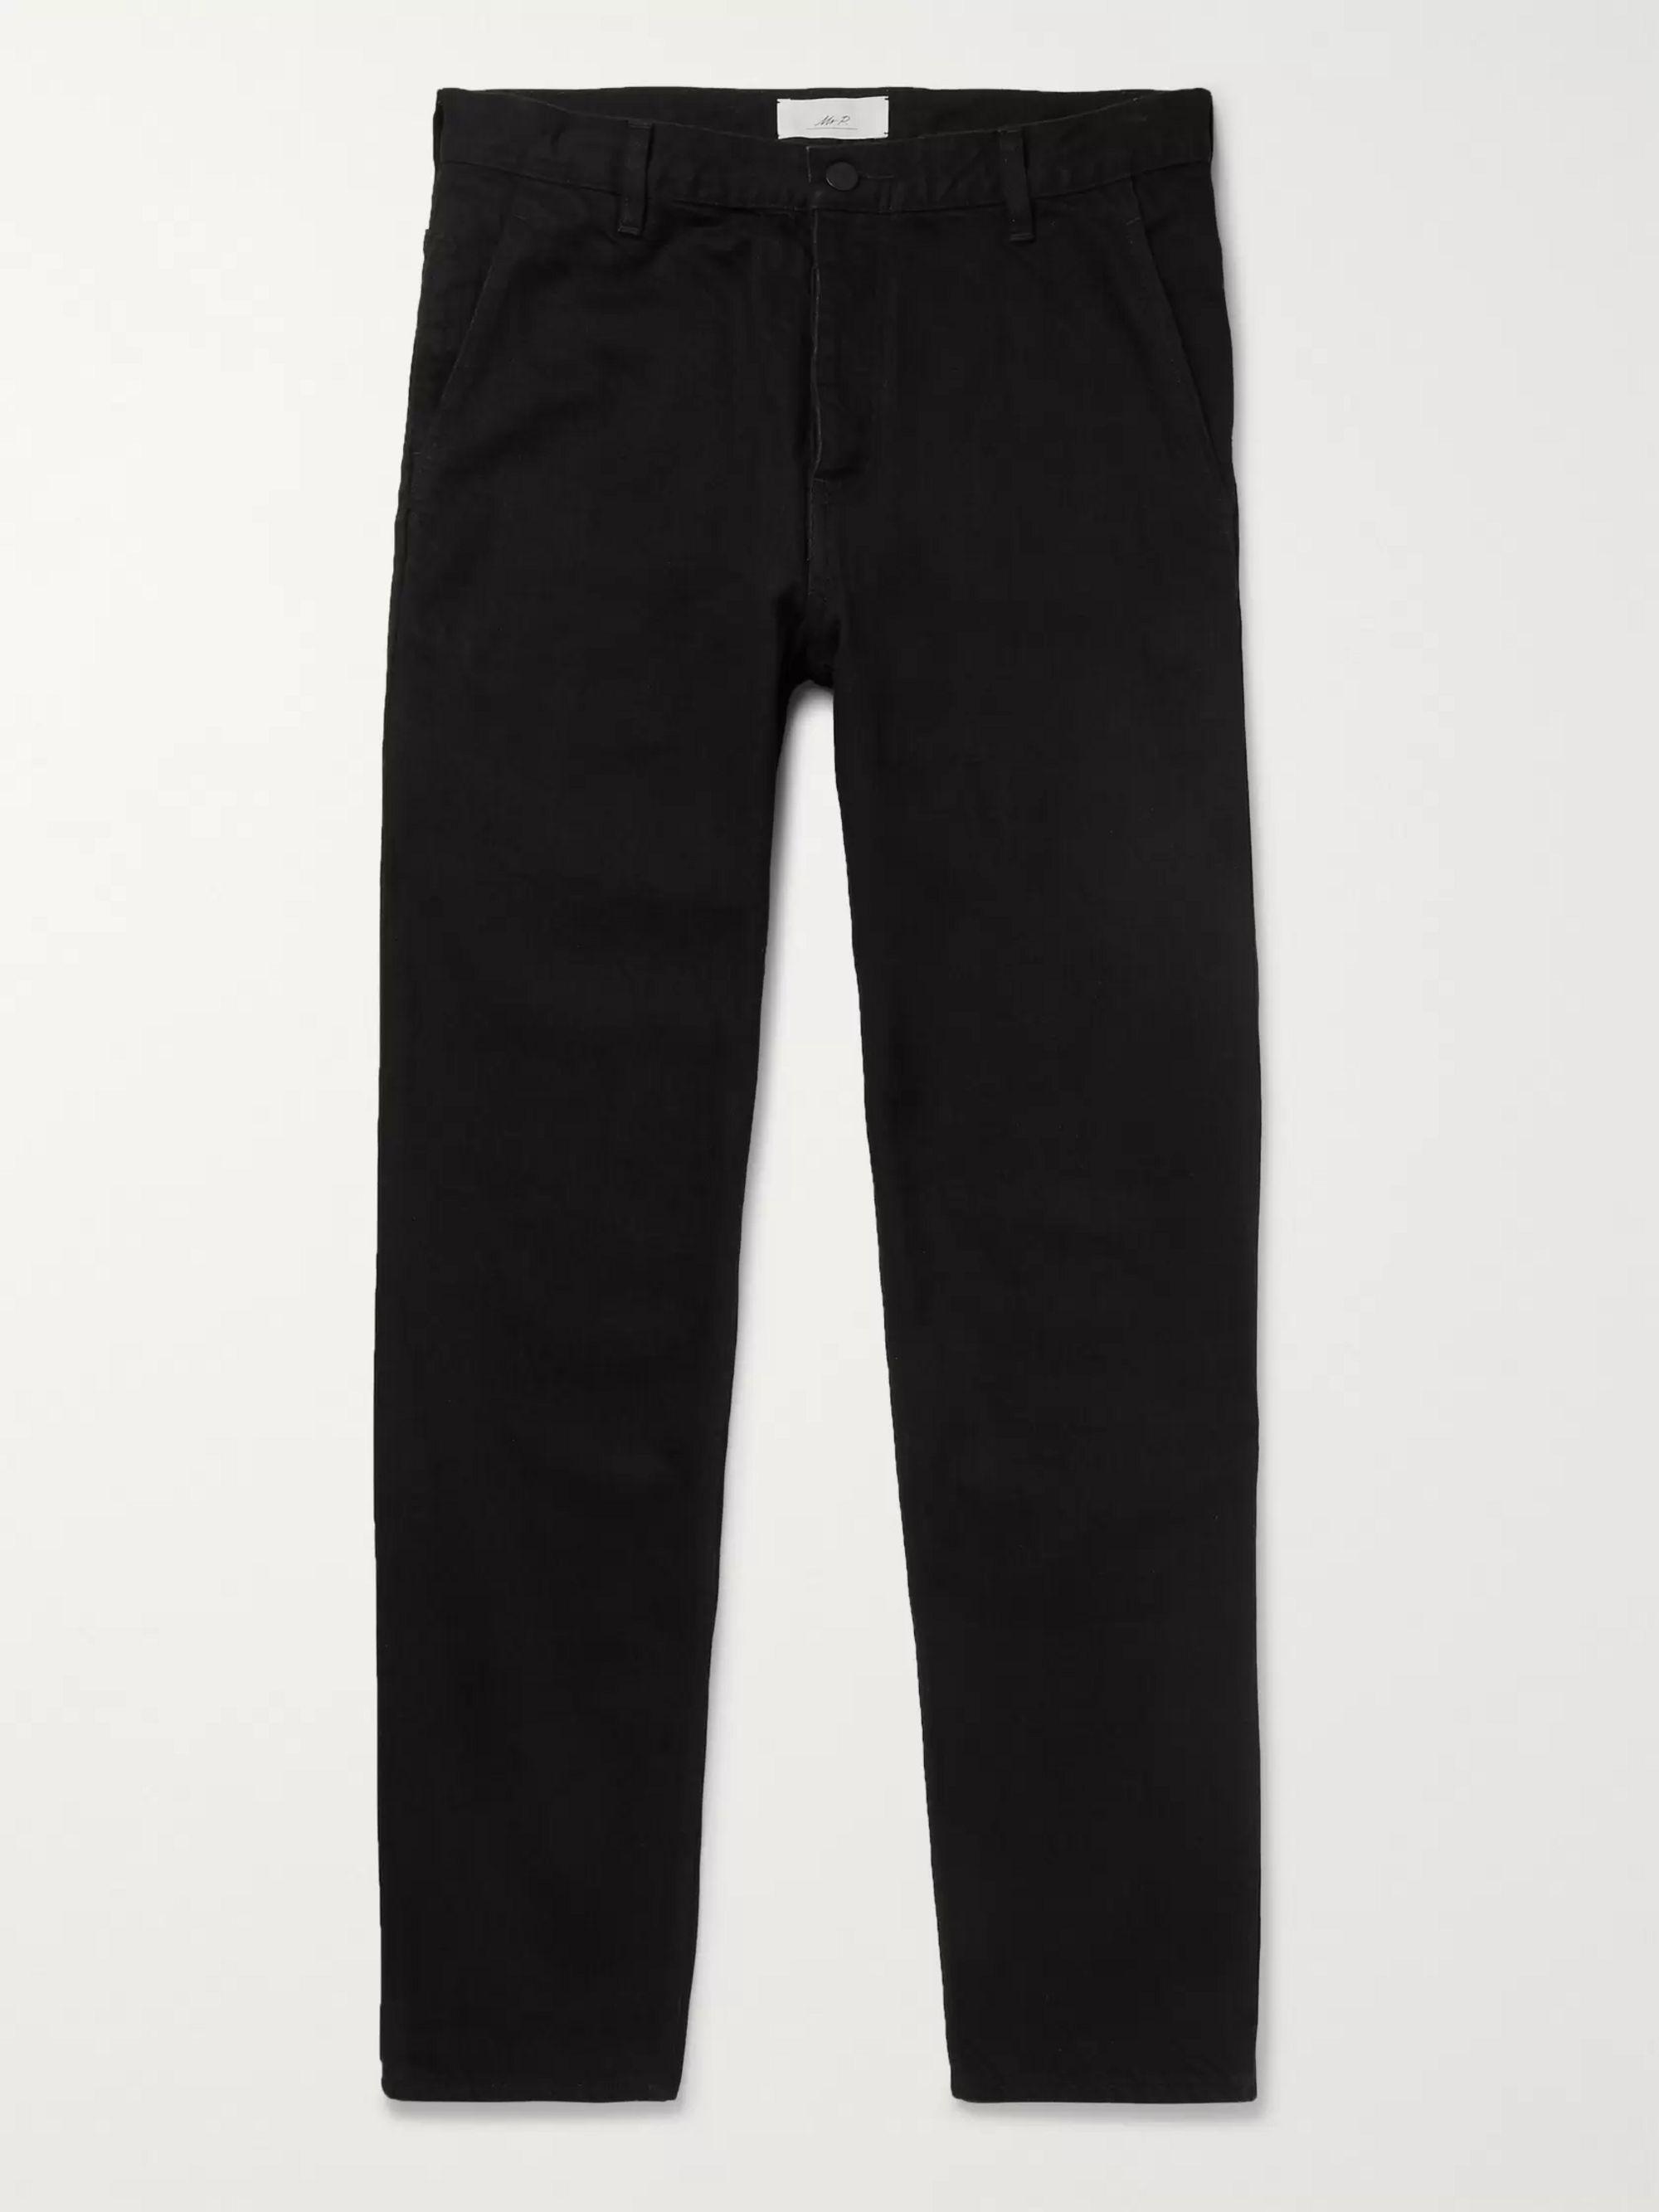 Mr. P Black Tapered Selvedge Denim Jeans,Black